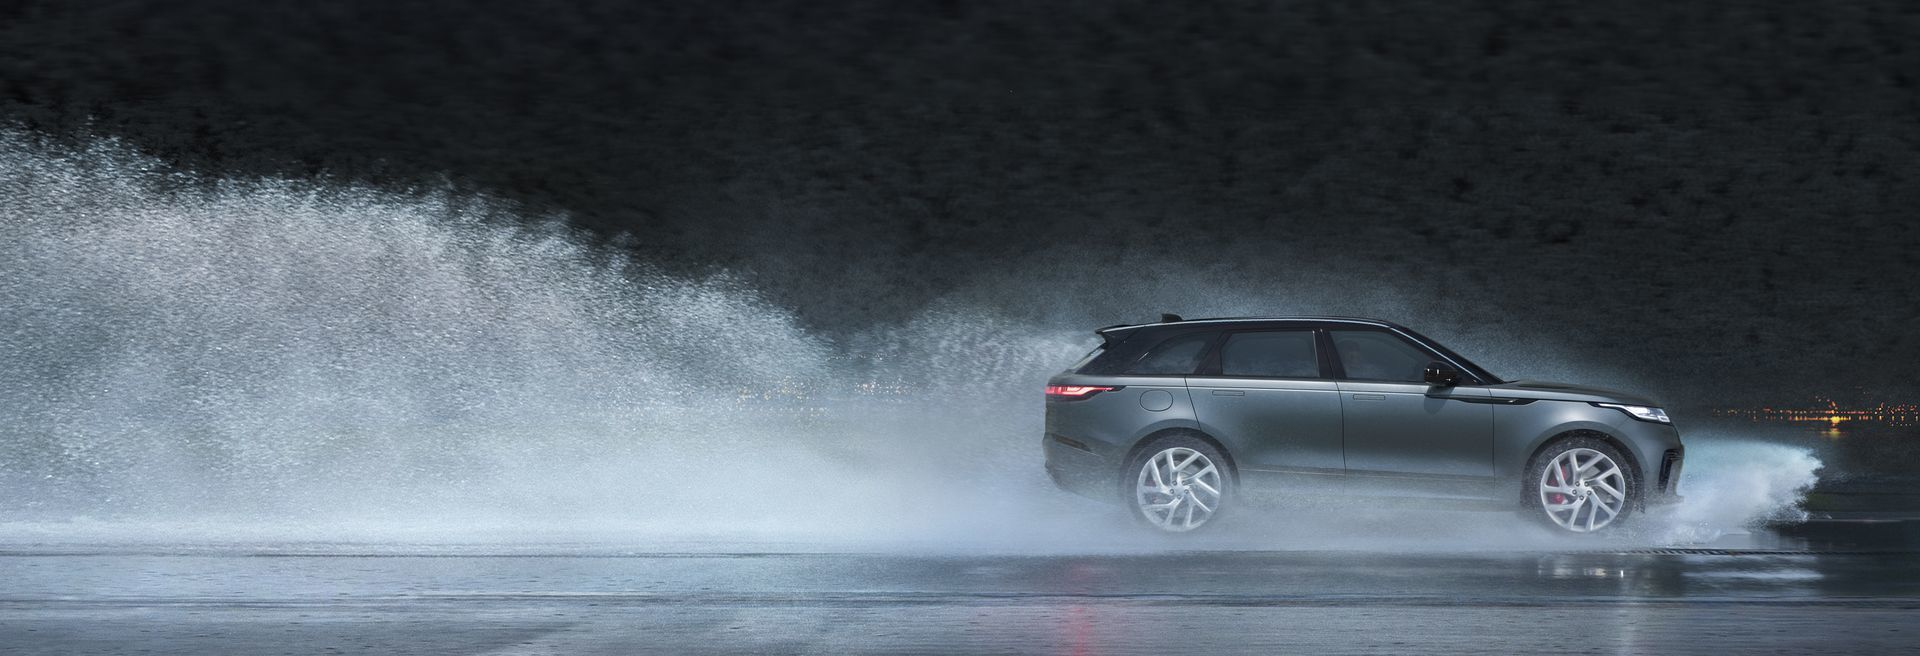 Range Rover Velar Svautobiography 18